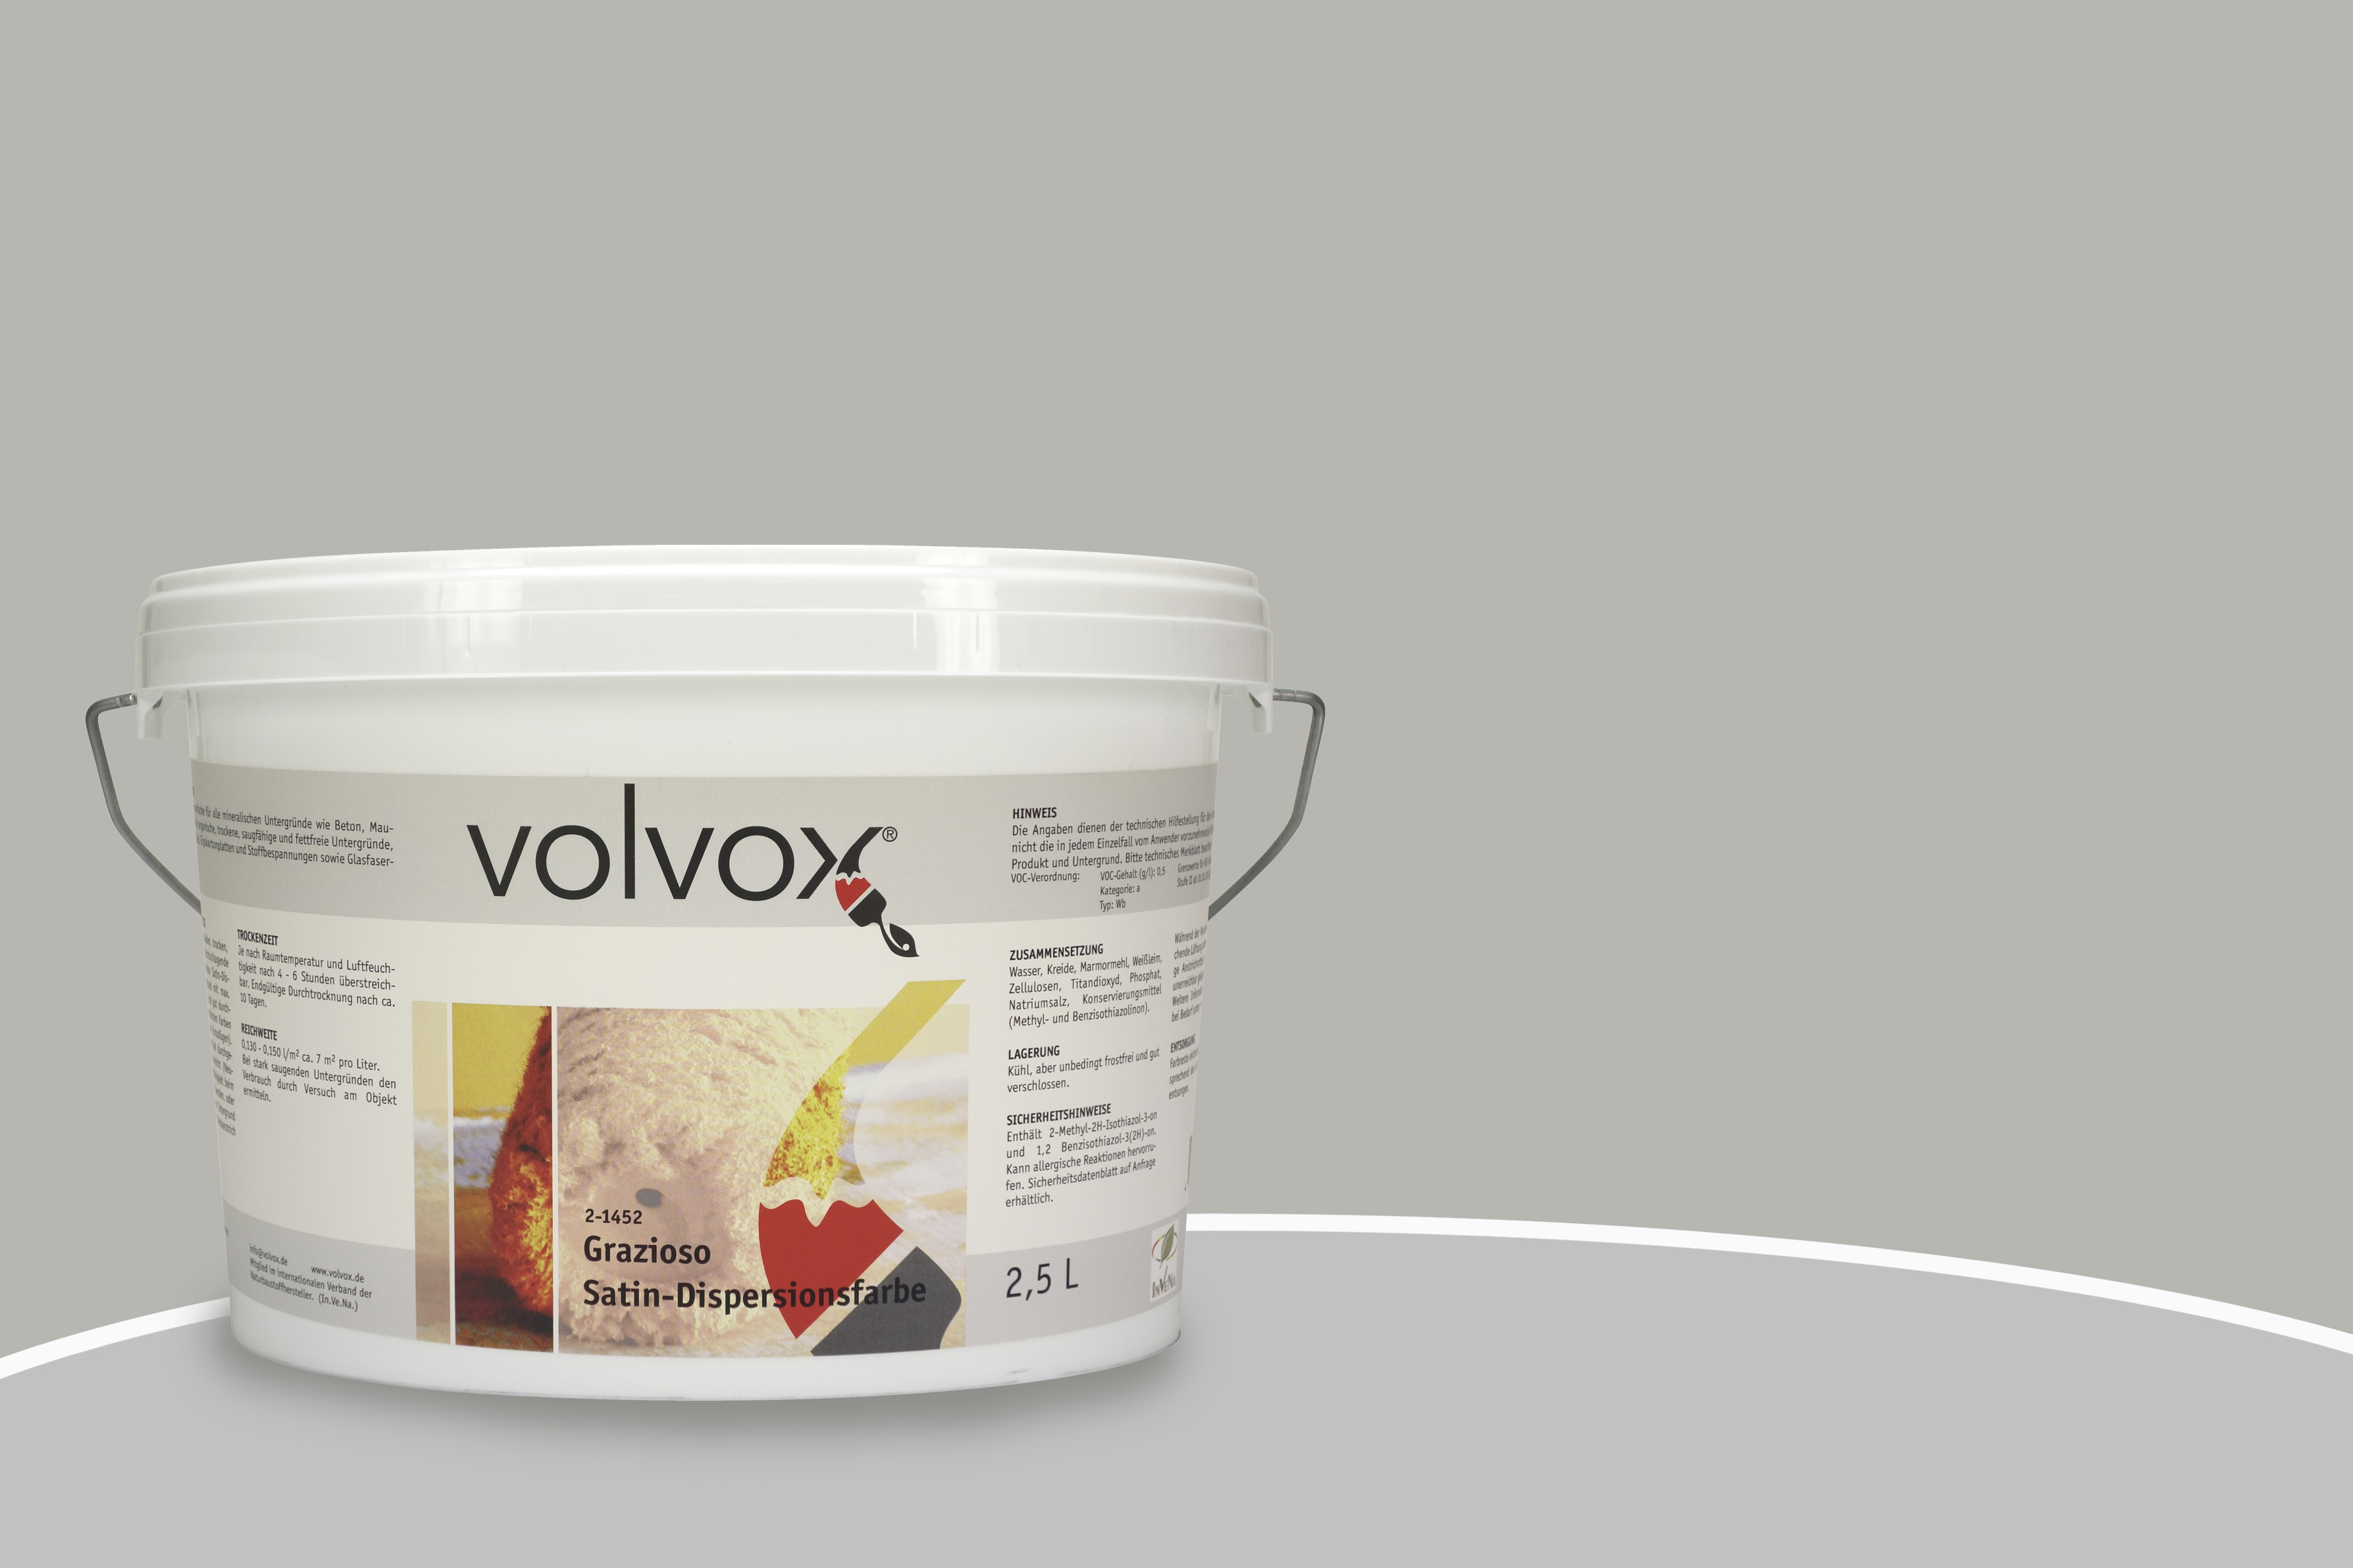 volvox grazioso satin-dispersionsfarbe calcit | naturanum